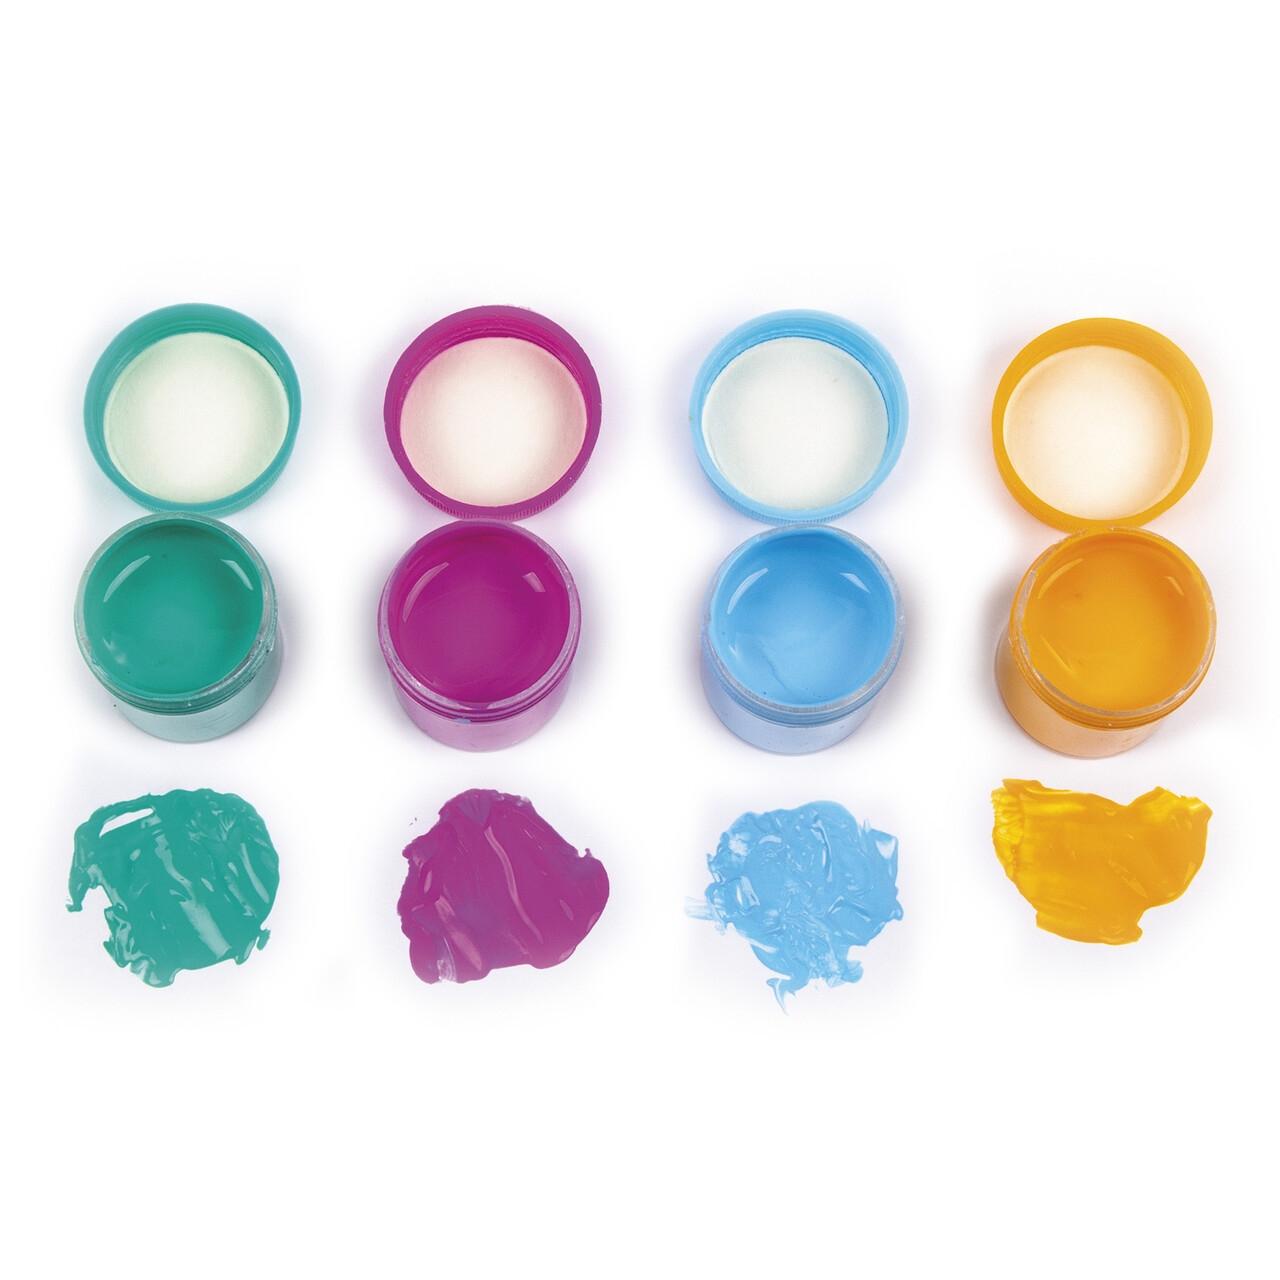 Farby plakatowe pastelowe Kidea, 24 kolory x 10ml (FPP24KKA)